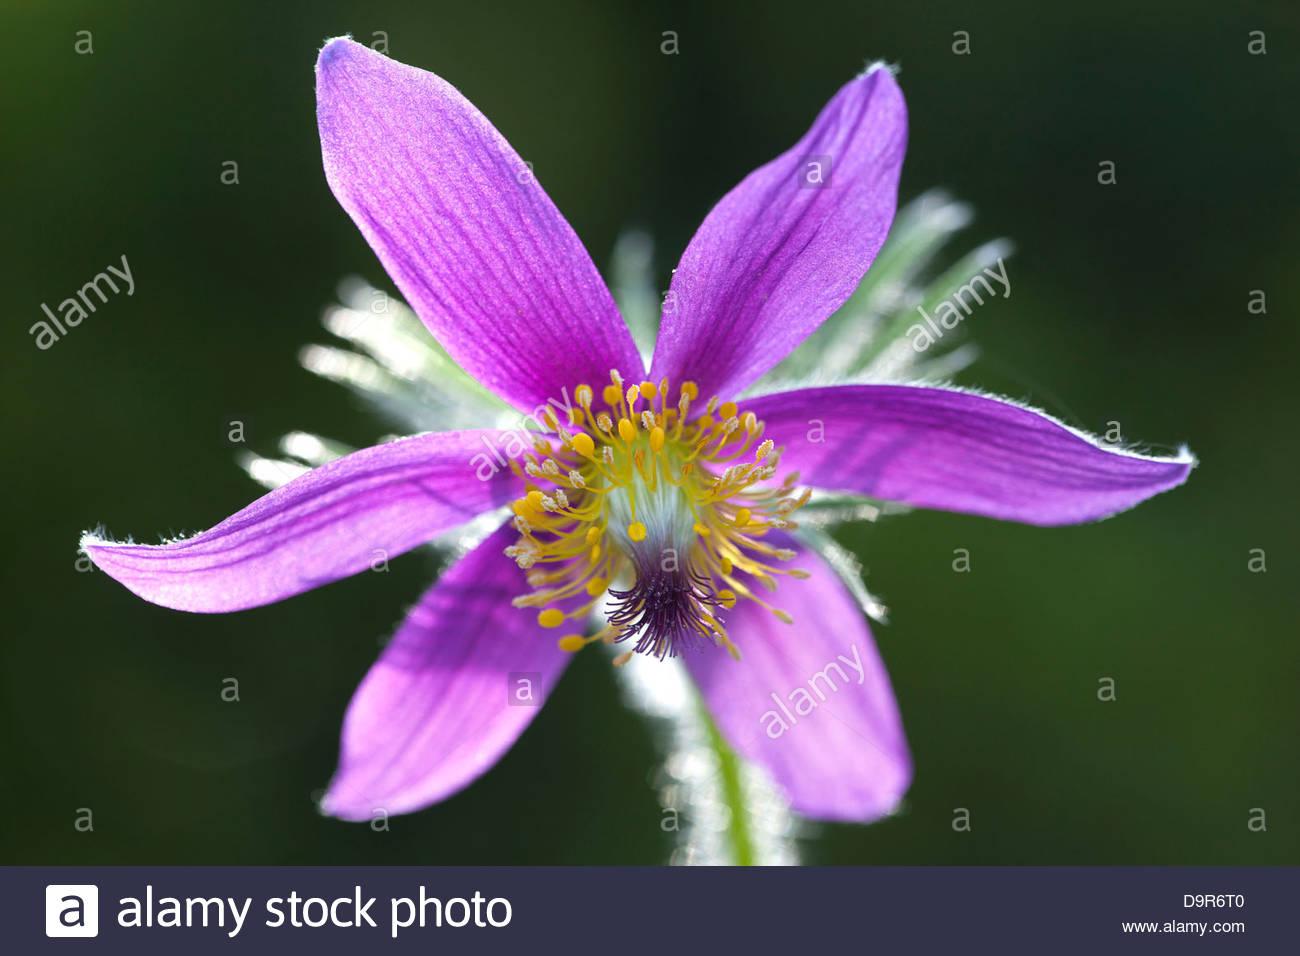 Pulsatilla vernalis,Spring Pasque flower or Arctic violet - Stock Image